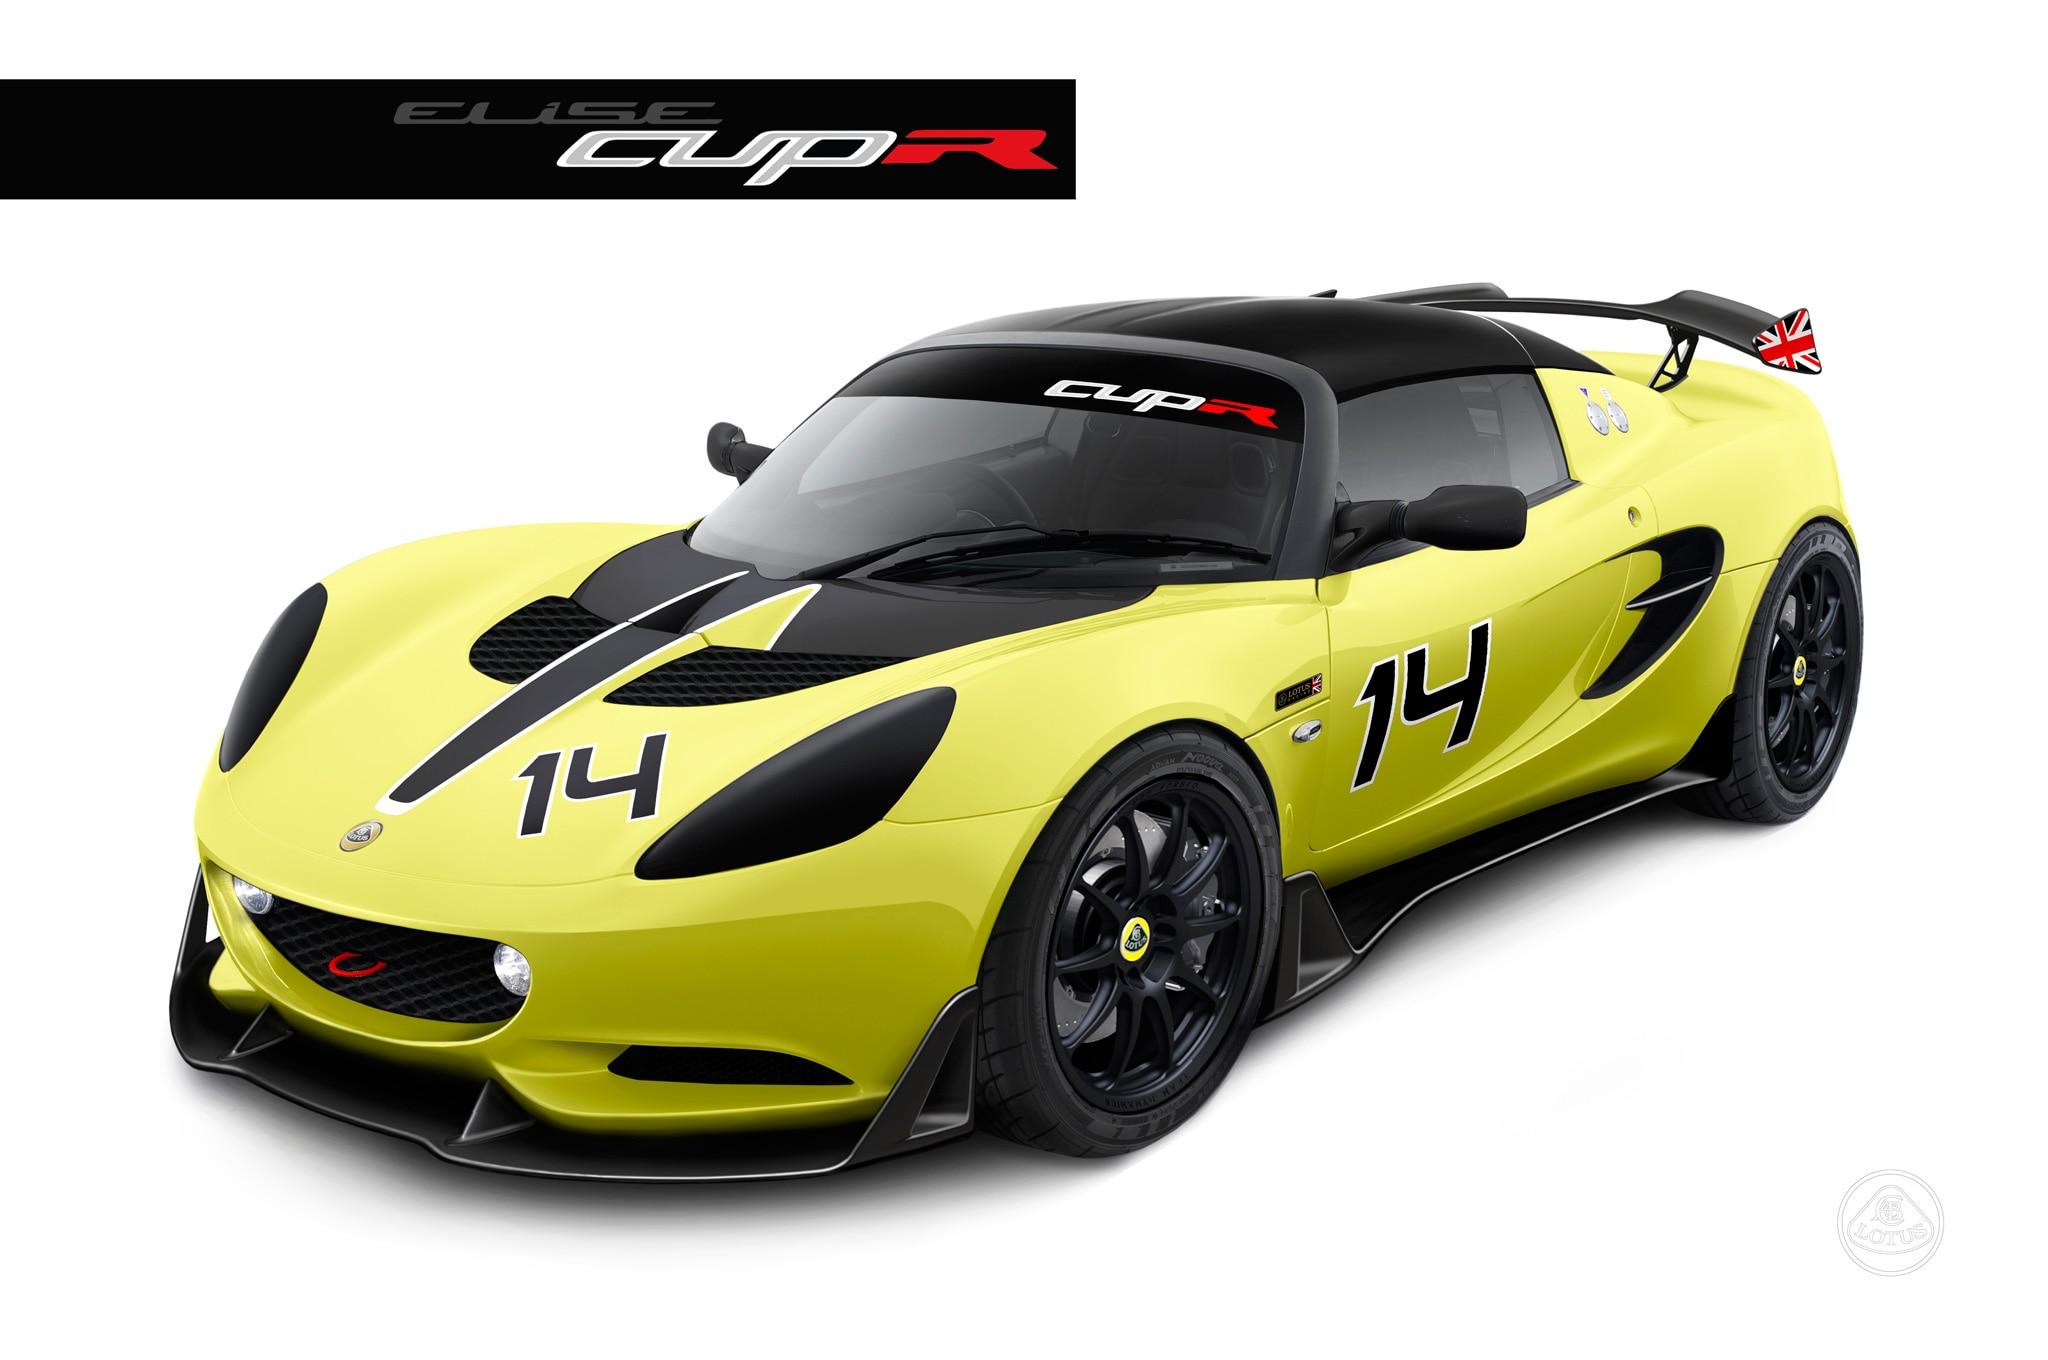 https://st.automobilemag.com/uploads/sites/11/2013/11/2014-Lotus-Elise-S-Cup-R-rendering.jpg